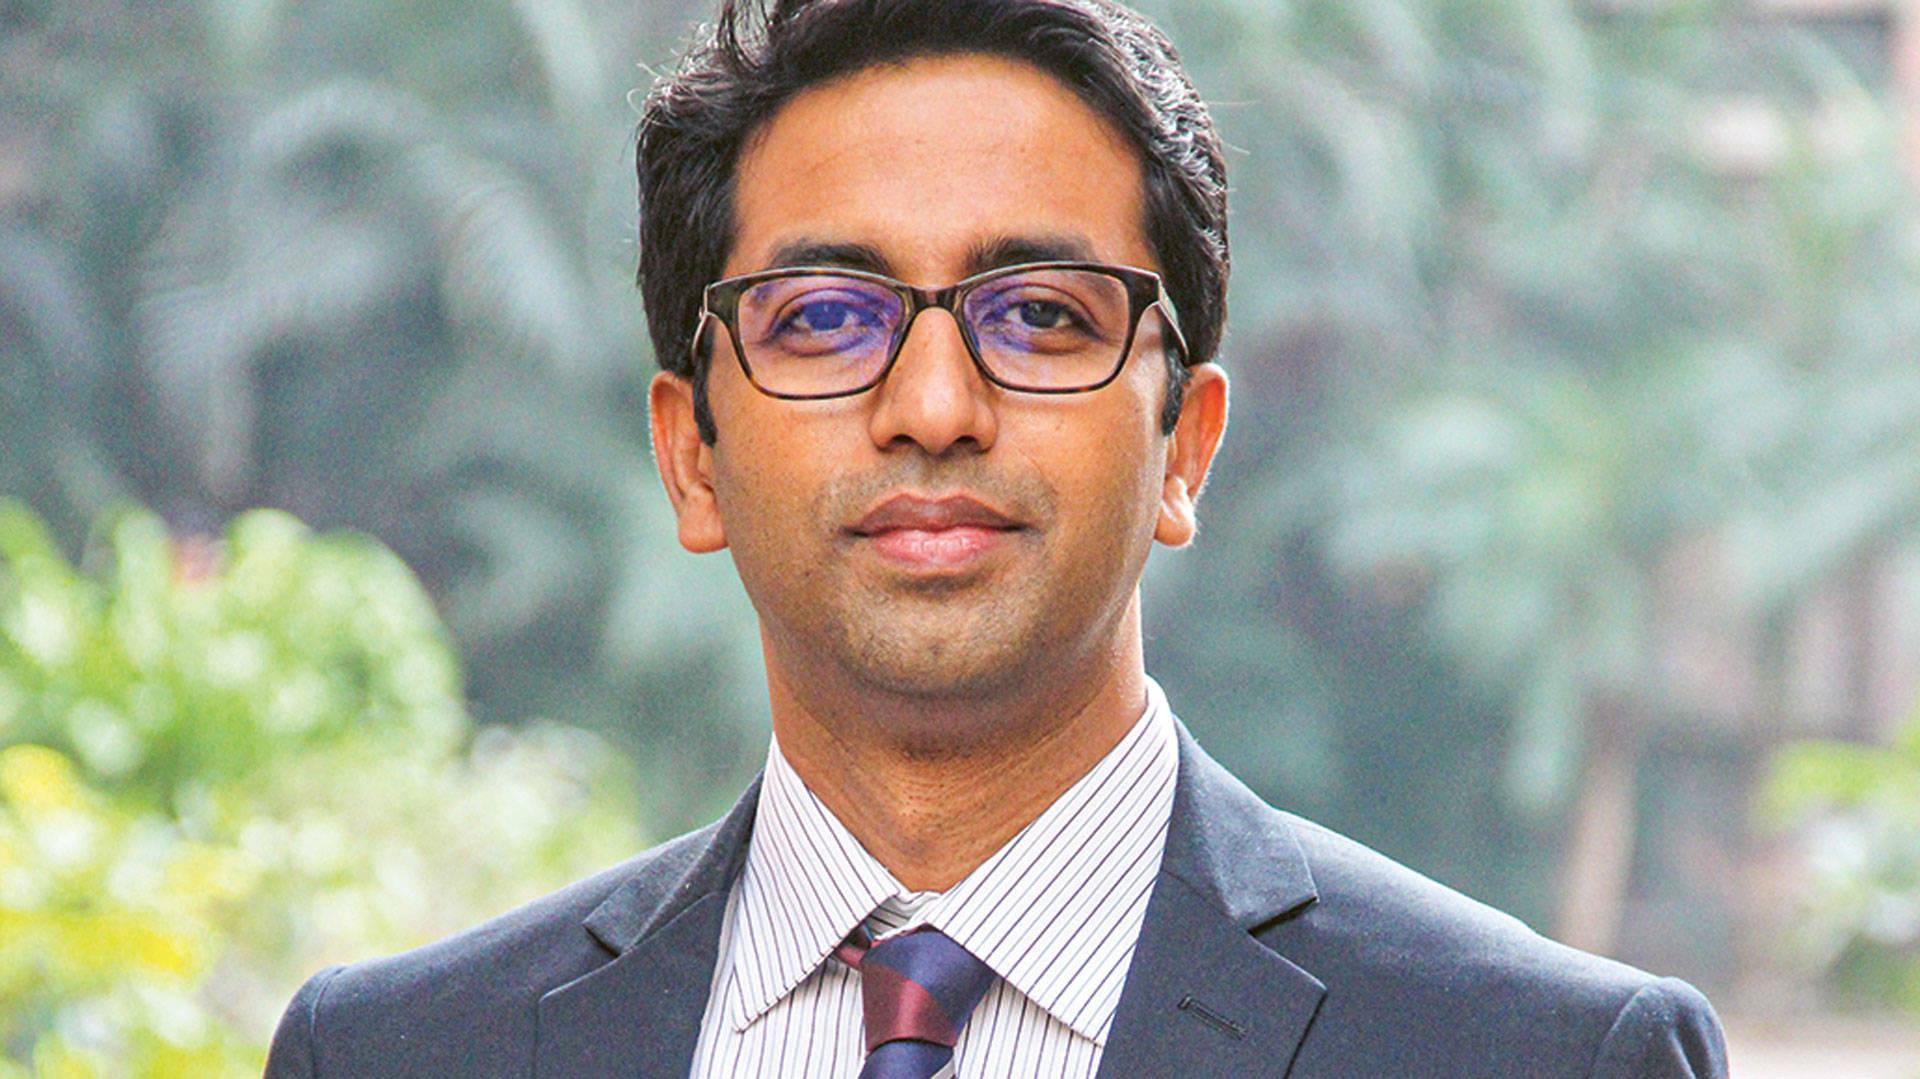 Sharif Qamar, Area Convener at The Energy and Resources Institute (TERI) in New Delhi